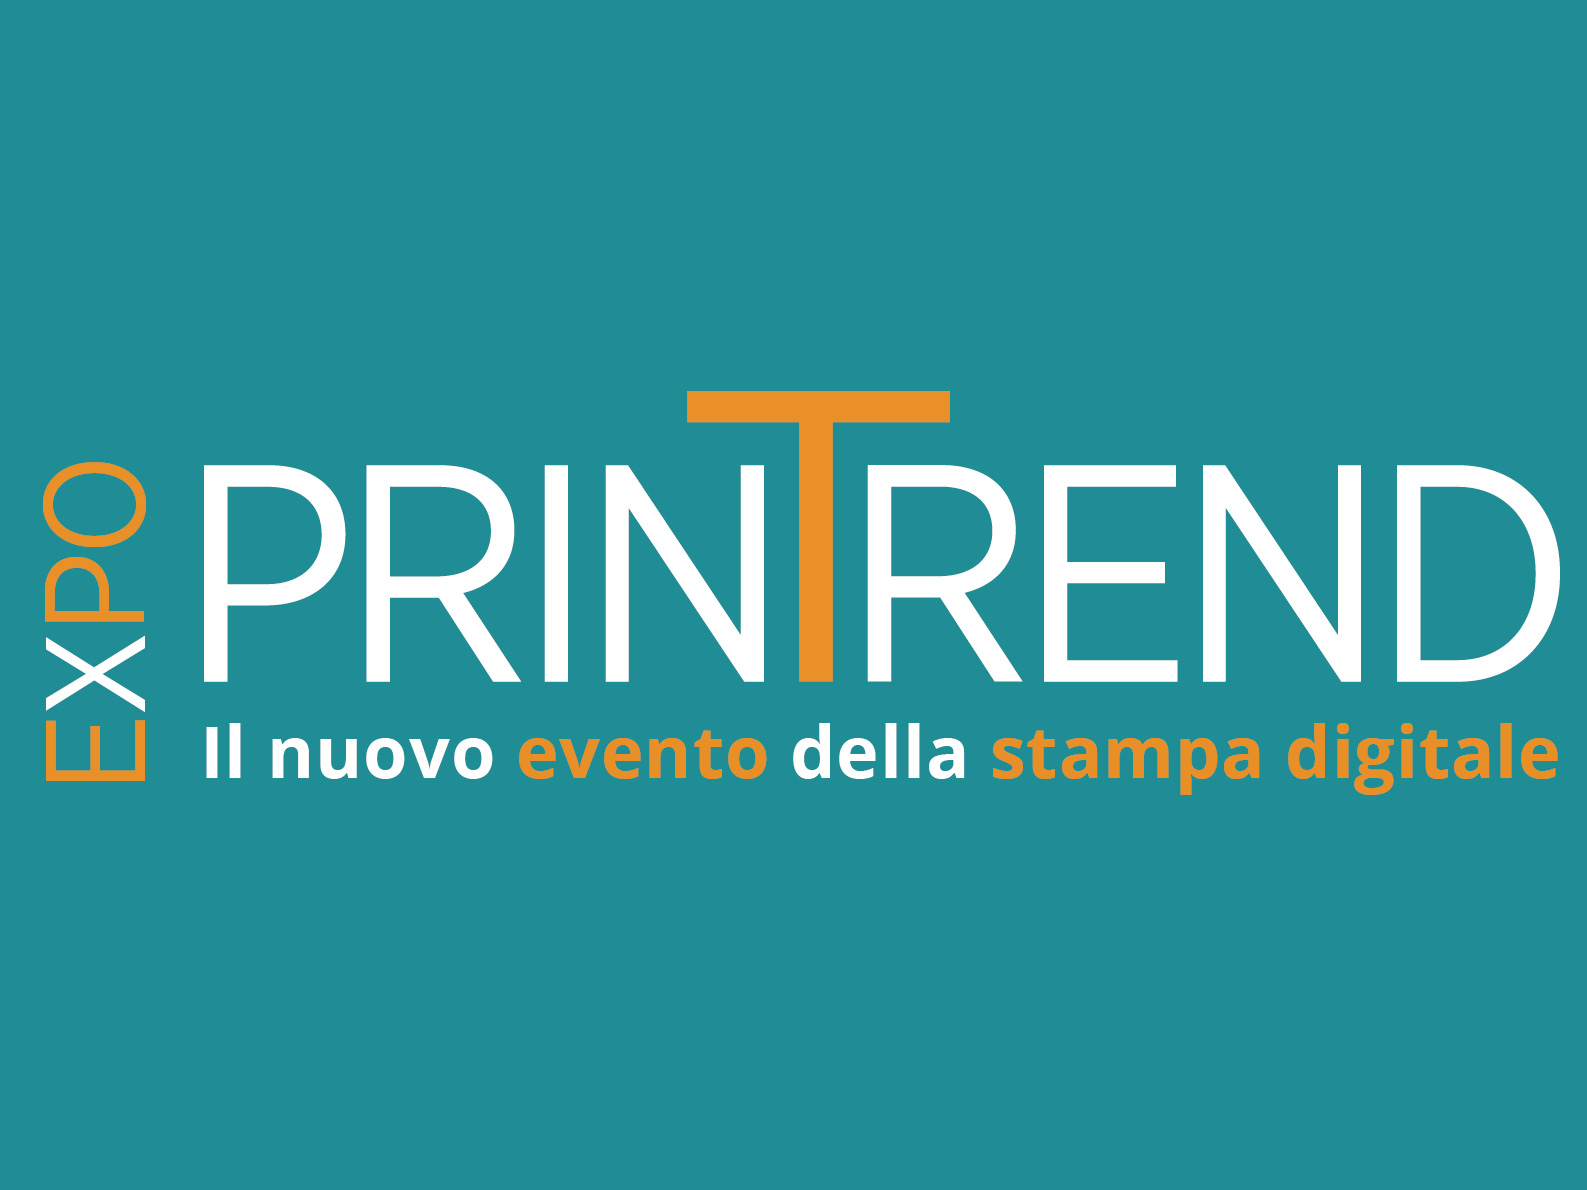 eventi_printrend